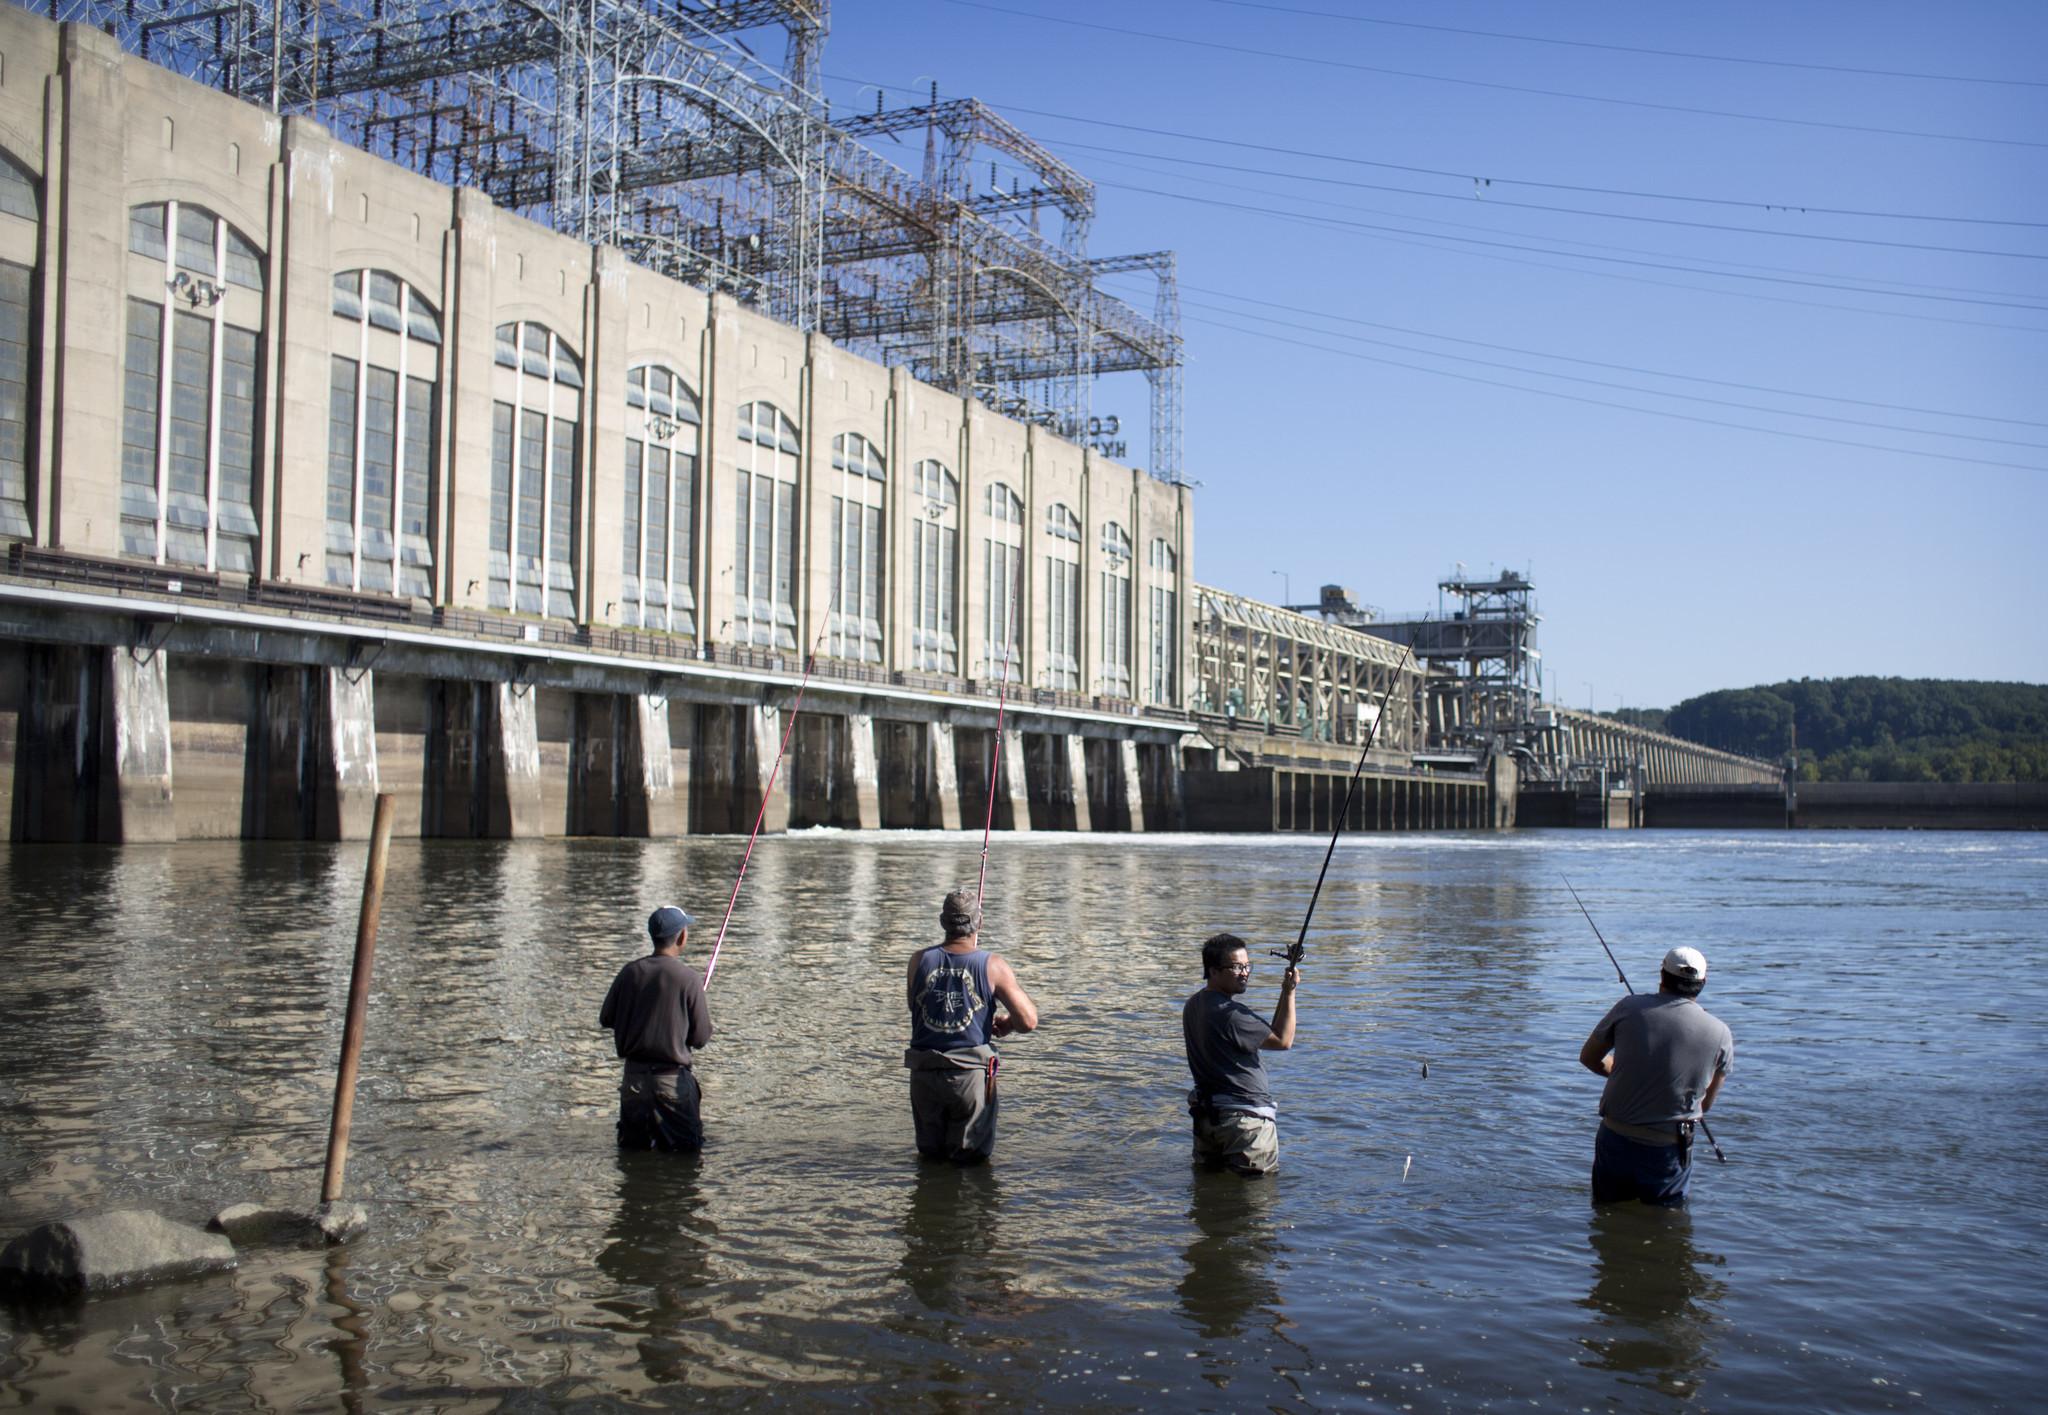 Conowingo Dam Fish Lift Overhaul Urged To Restore